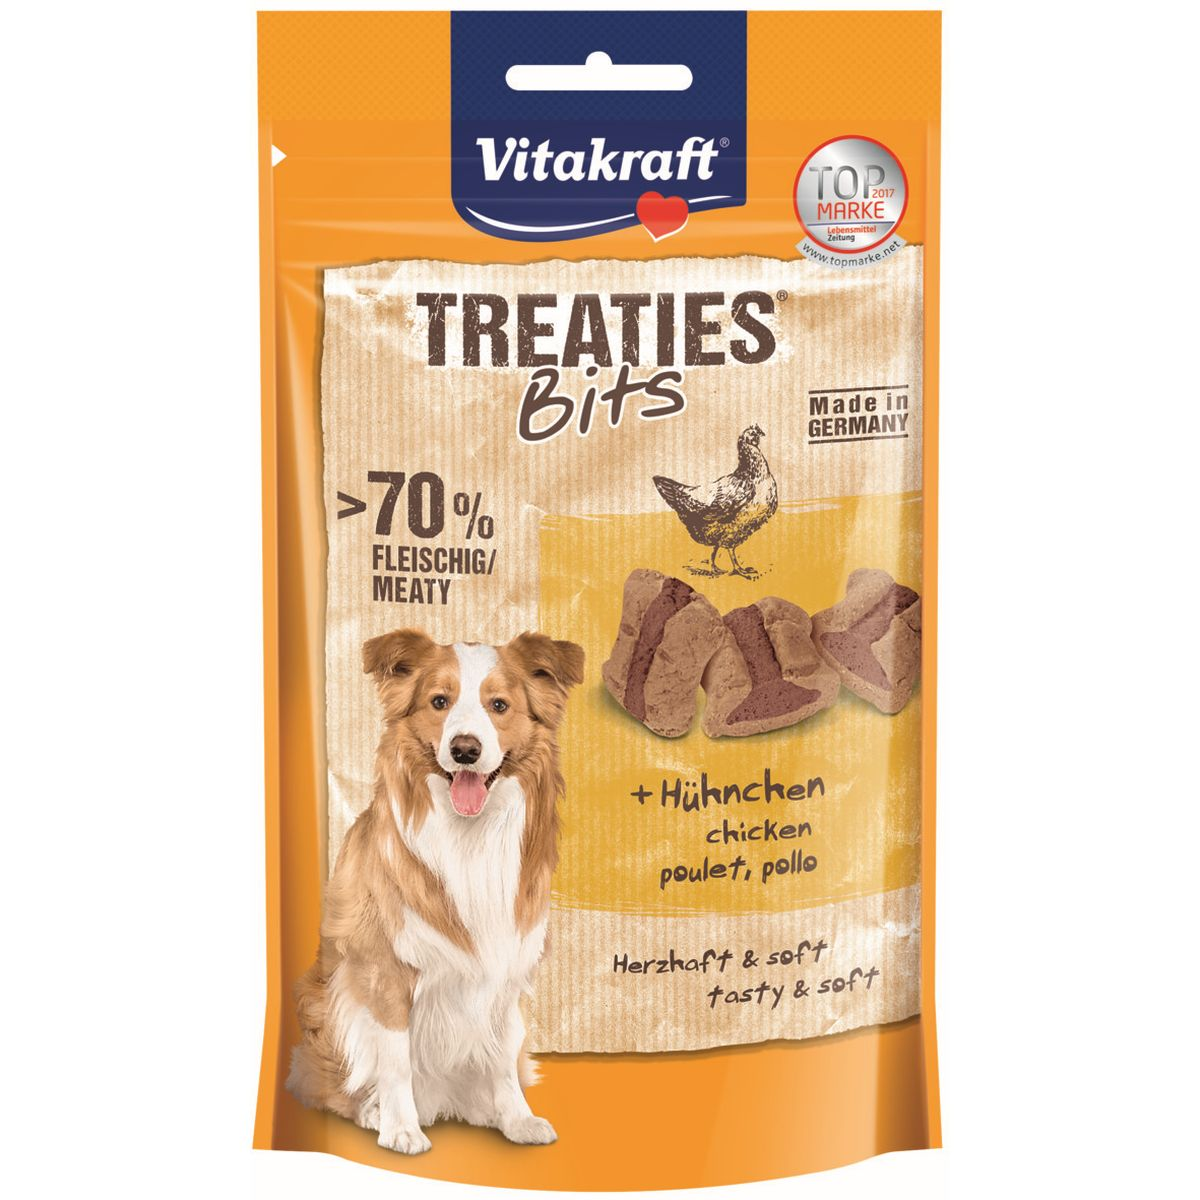 Vitakraft Treaties Bits hondensnack Kip